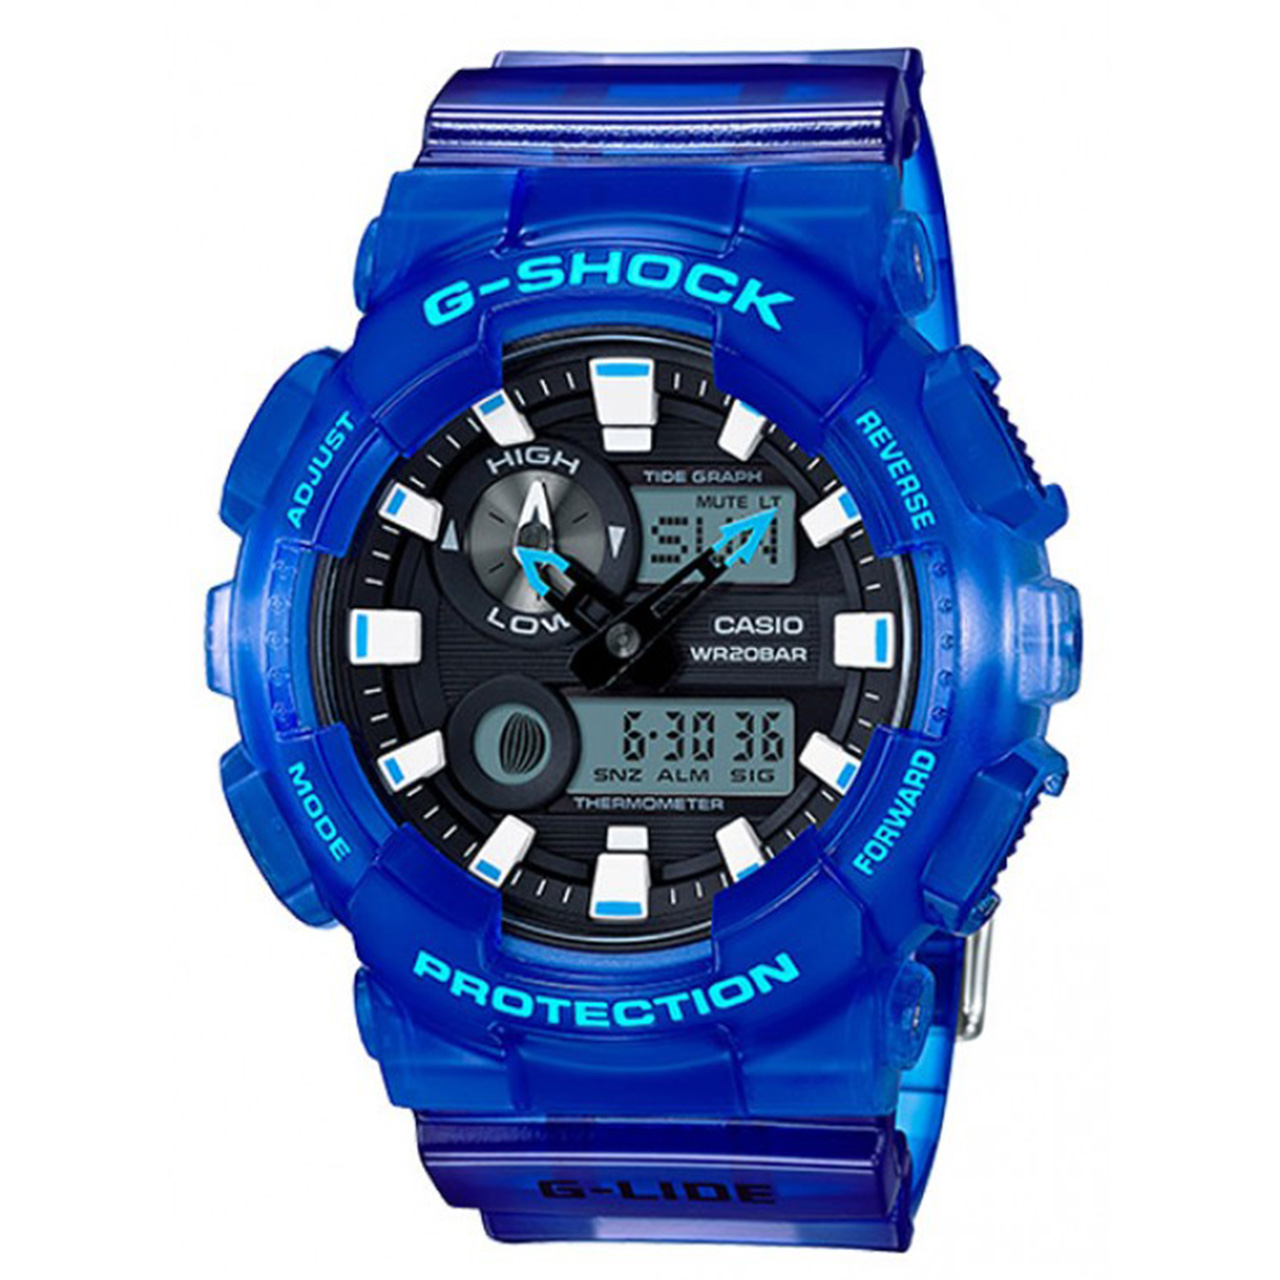 ساعت مچی دیجیتالی مردانه کاسیو جی شاک GAX-100MSA-2ADR